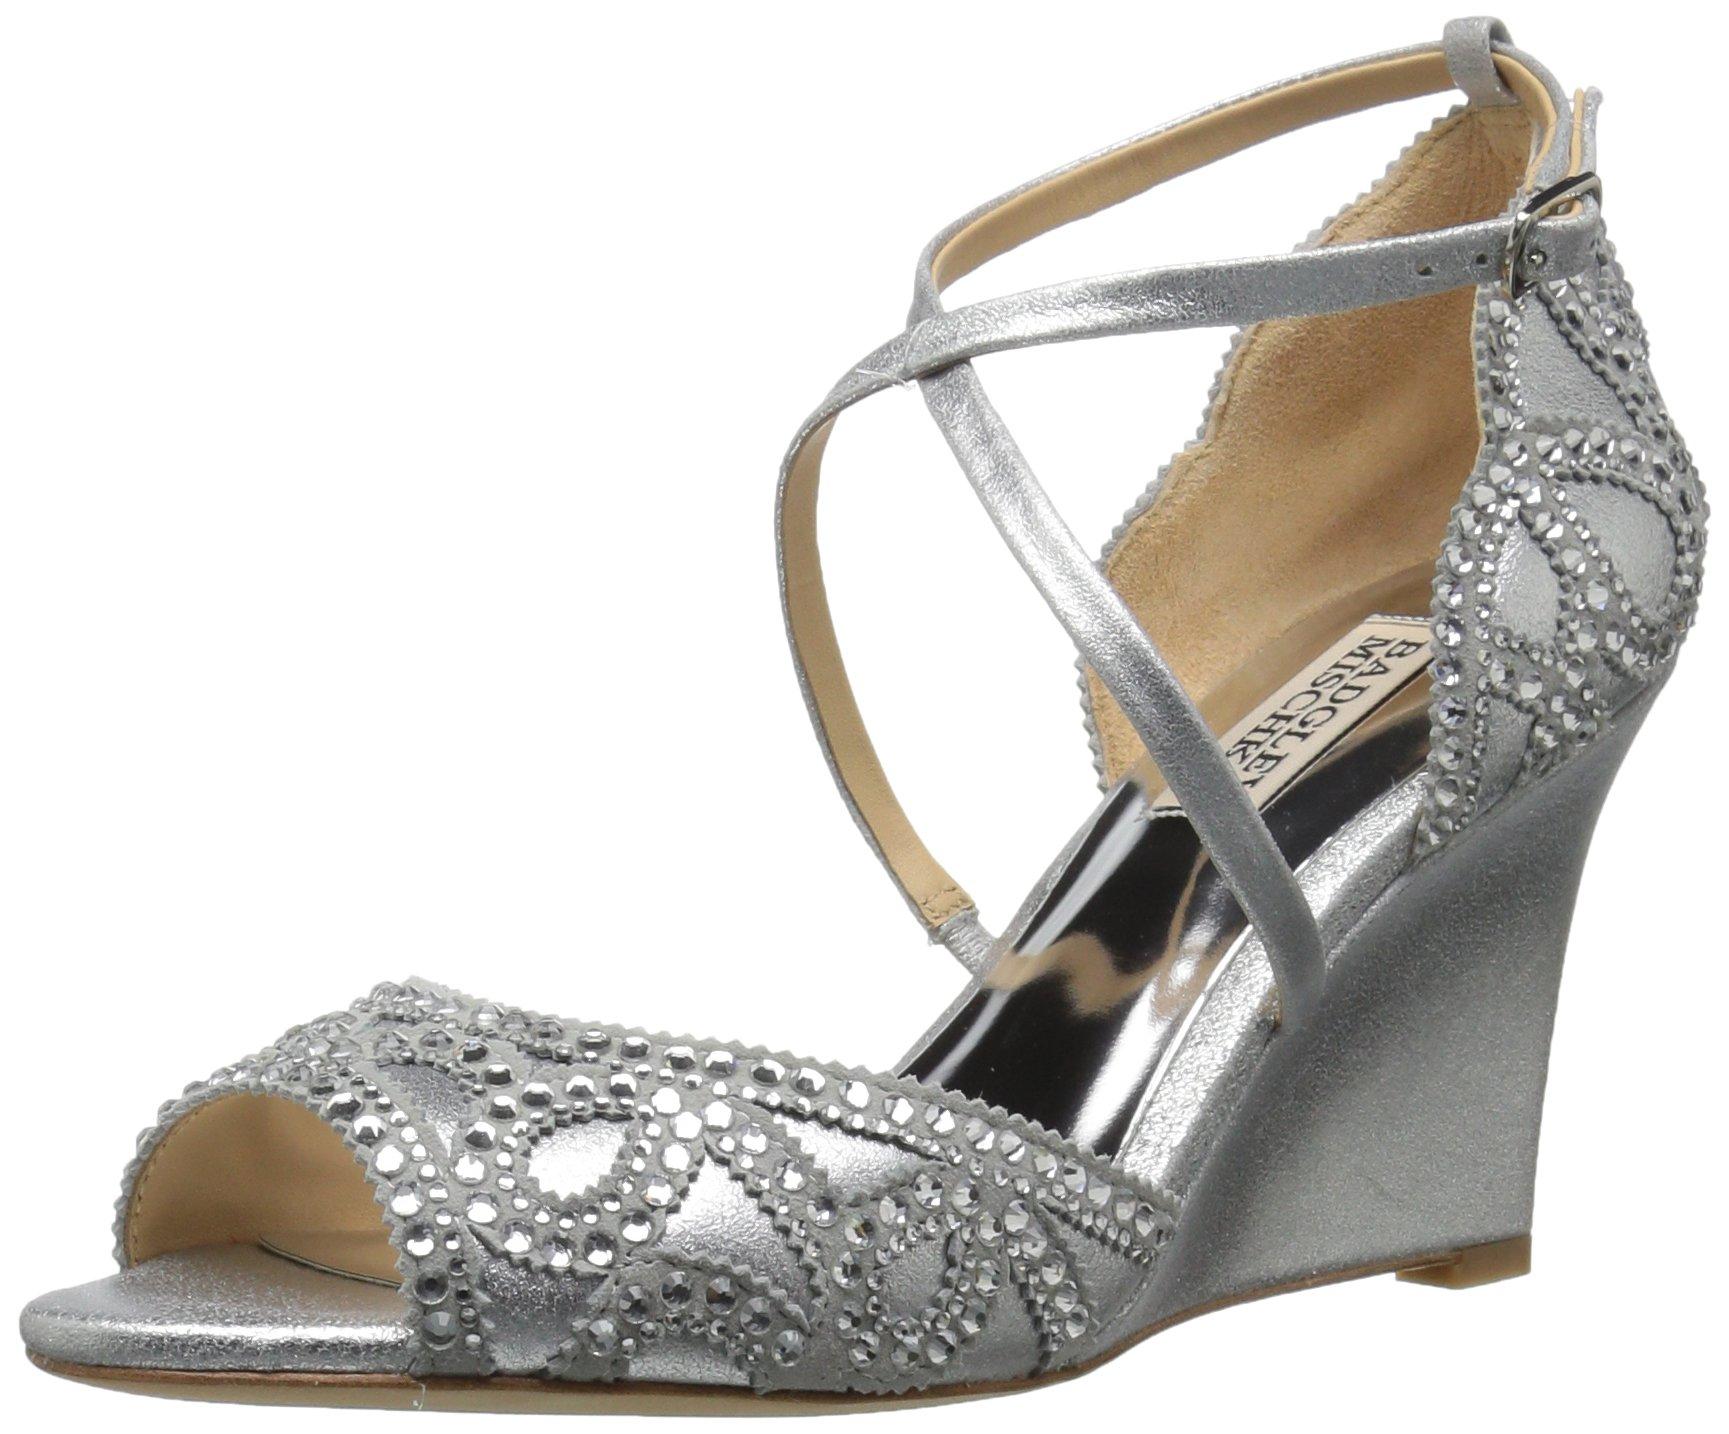 Badgley Mischka Women's Winter Wedge Sandal, Silver, 5.5 M US